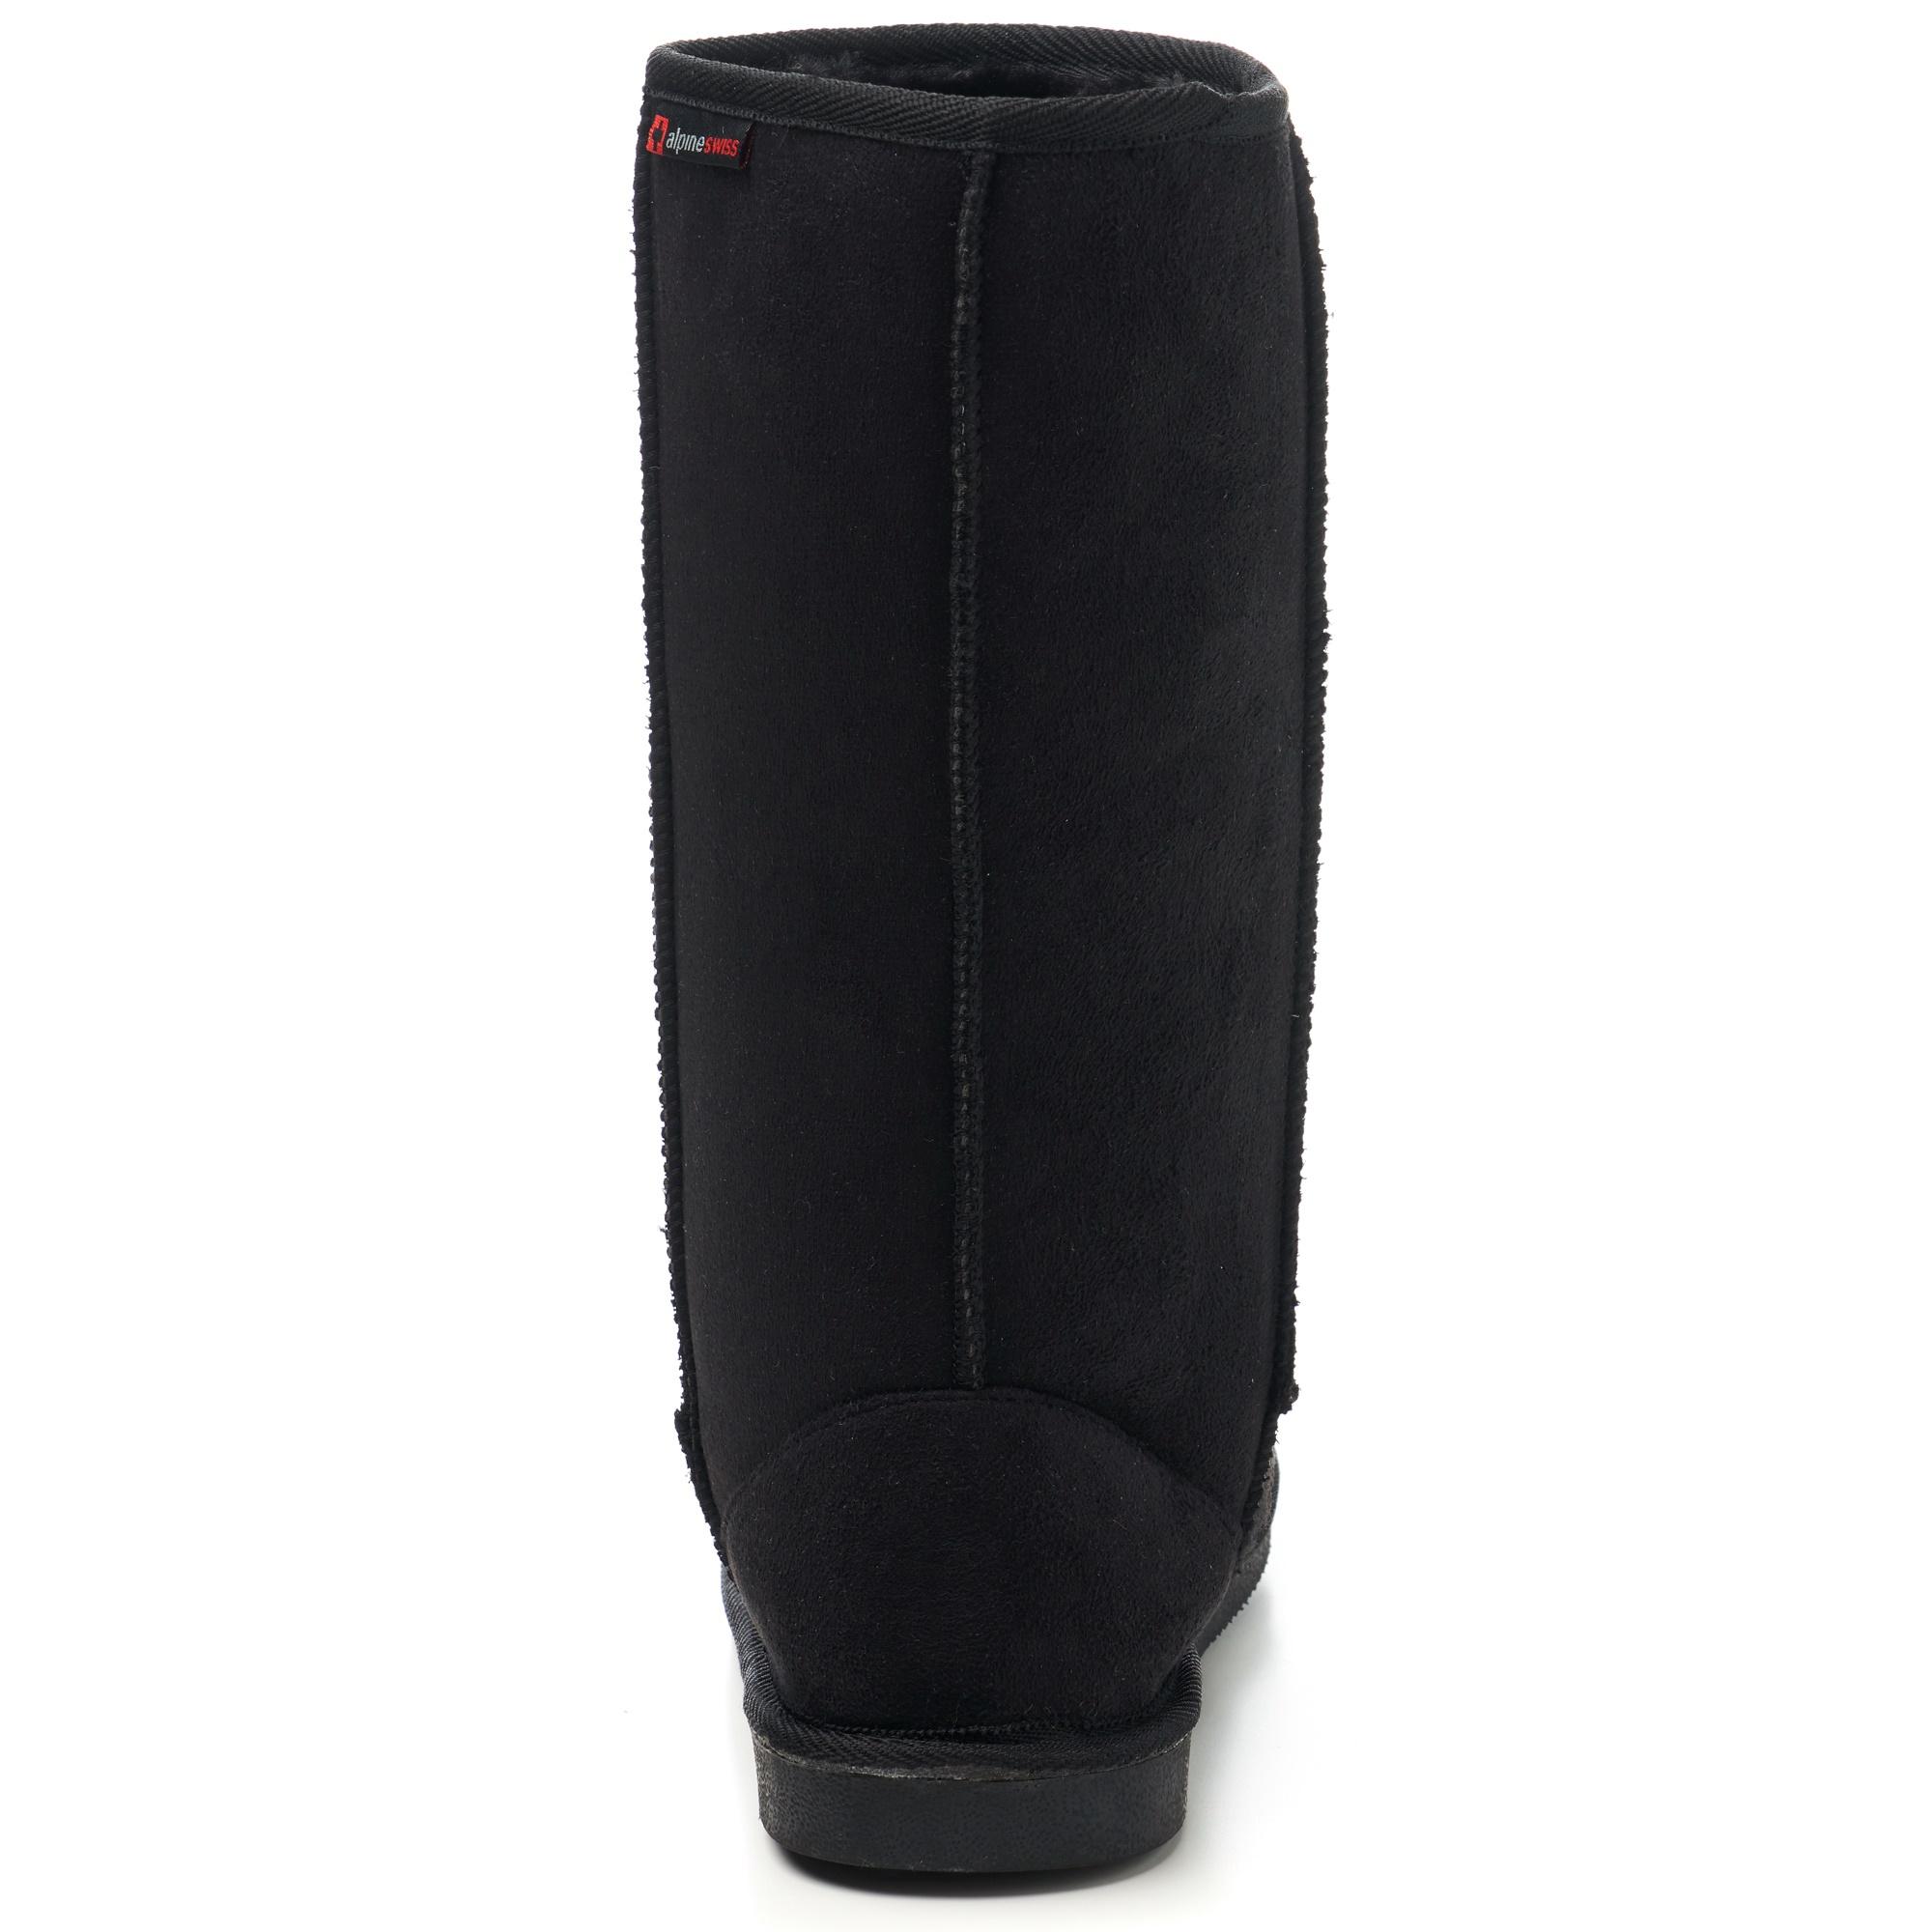 Alpine-Swiss-Women-Boots-MidCalf-12-034-Aussie-Classic-Faux-Shearling-Sheepskin-Fur